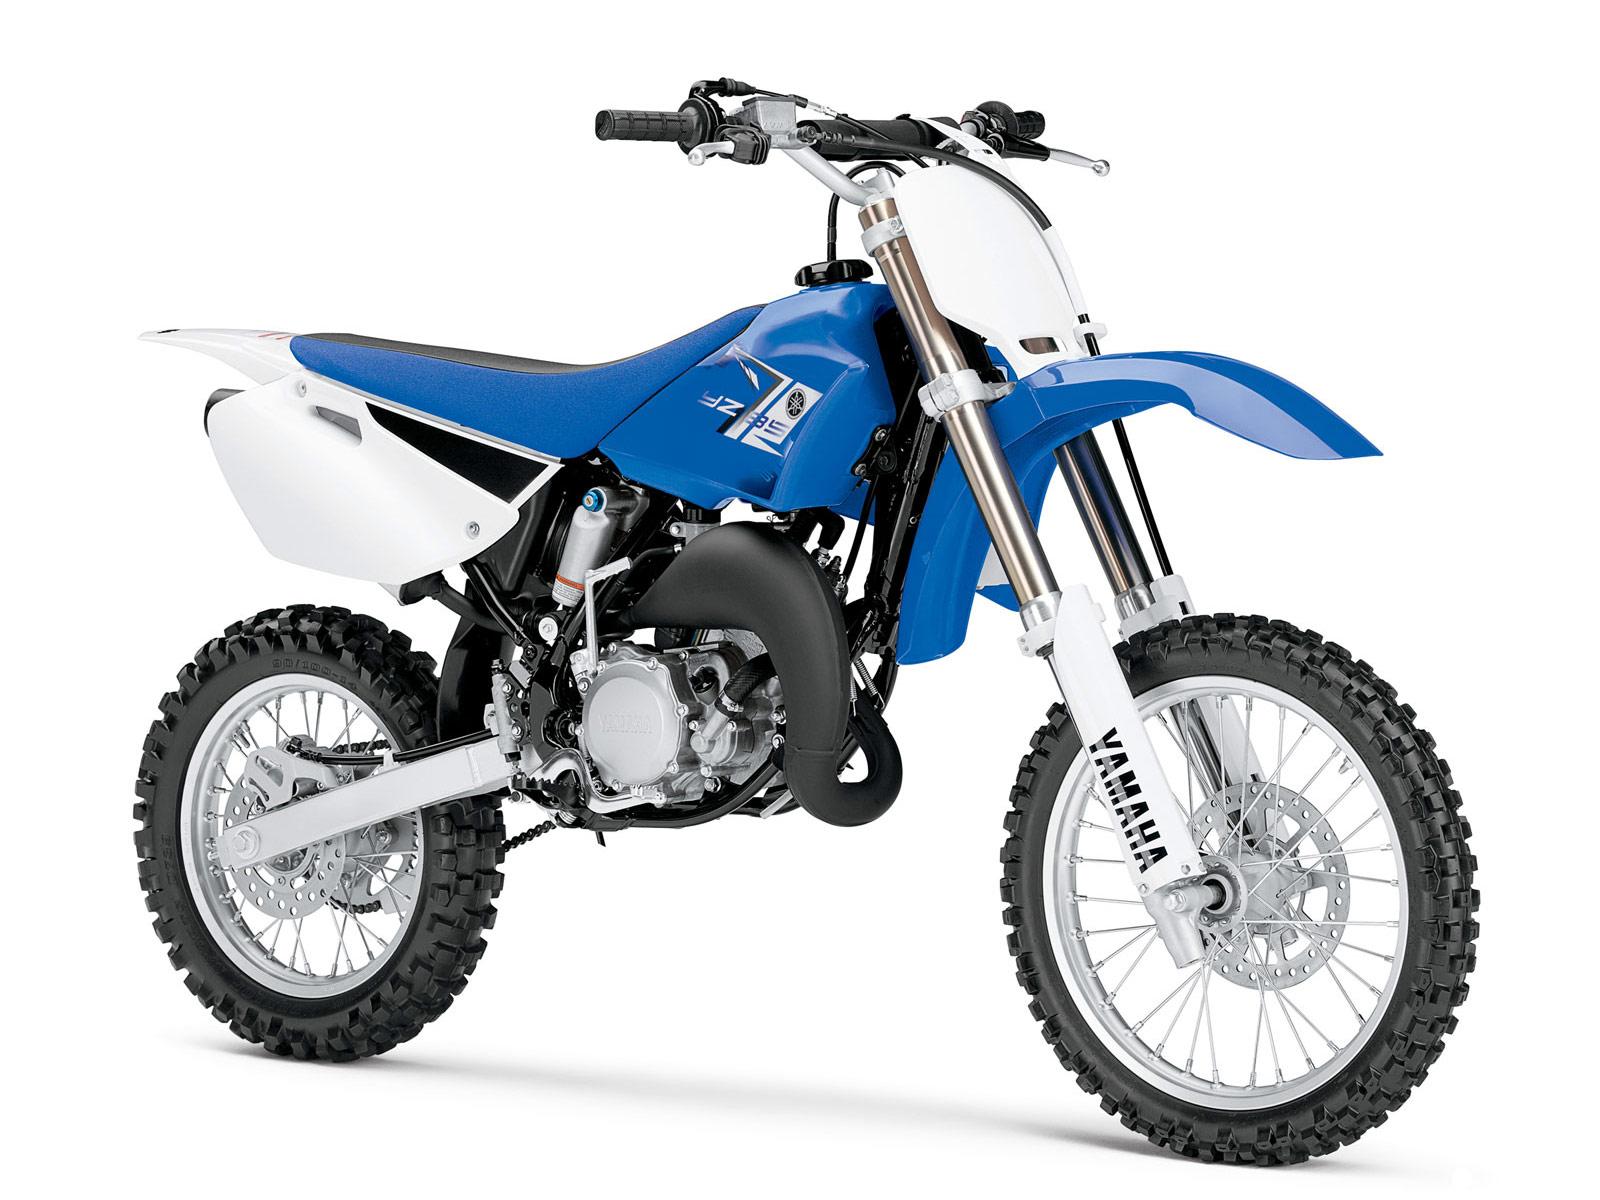 2013 Yamaha YZ85 2-Stroke motorcycle insurance information